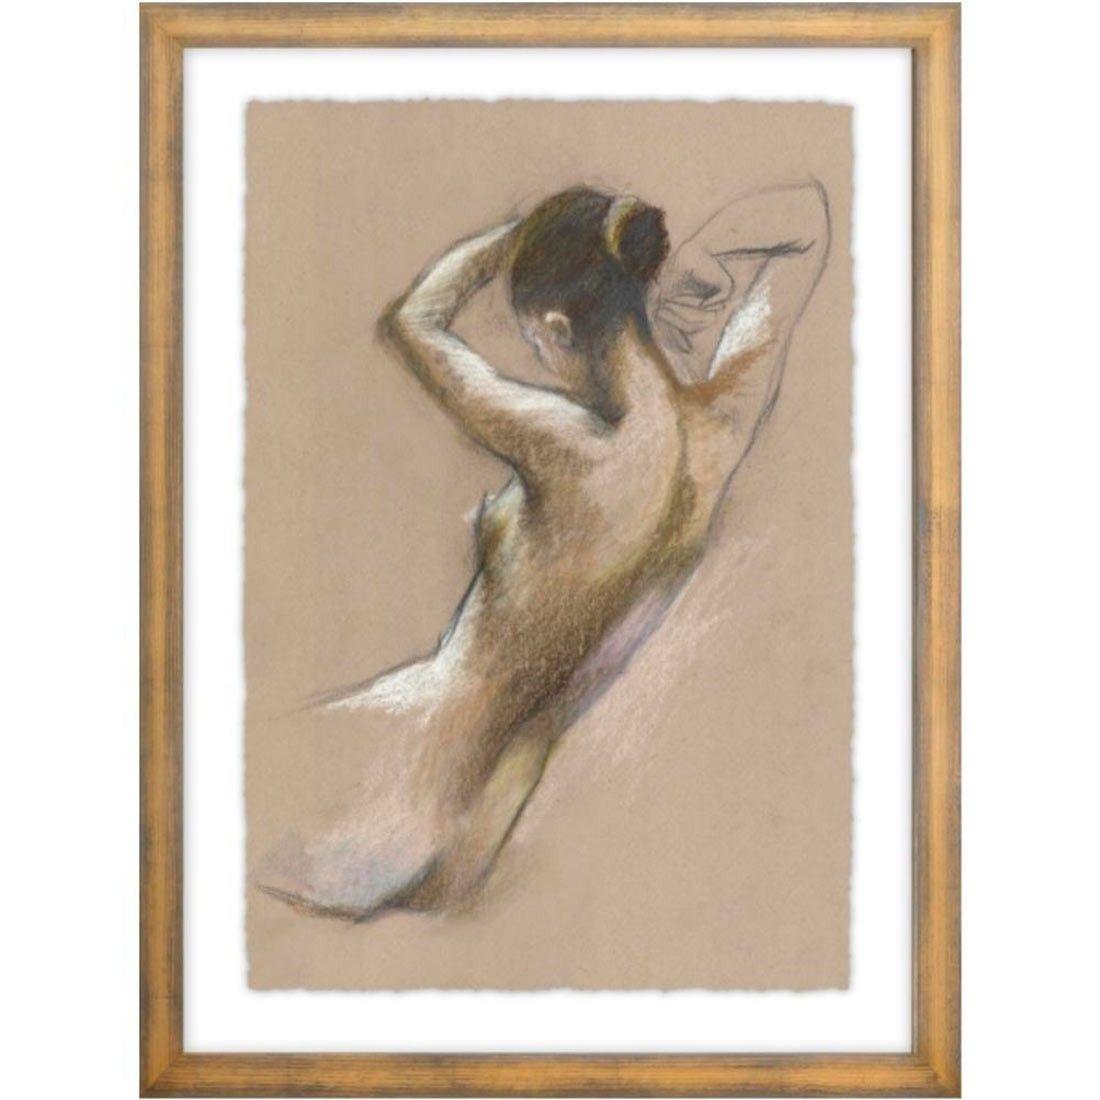 Perfect Posture I Framed | Modern wall decor art, Wall art ...